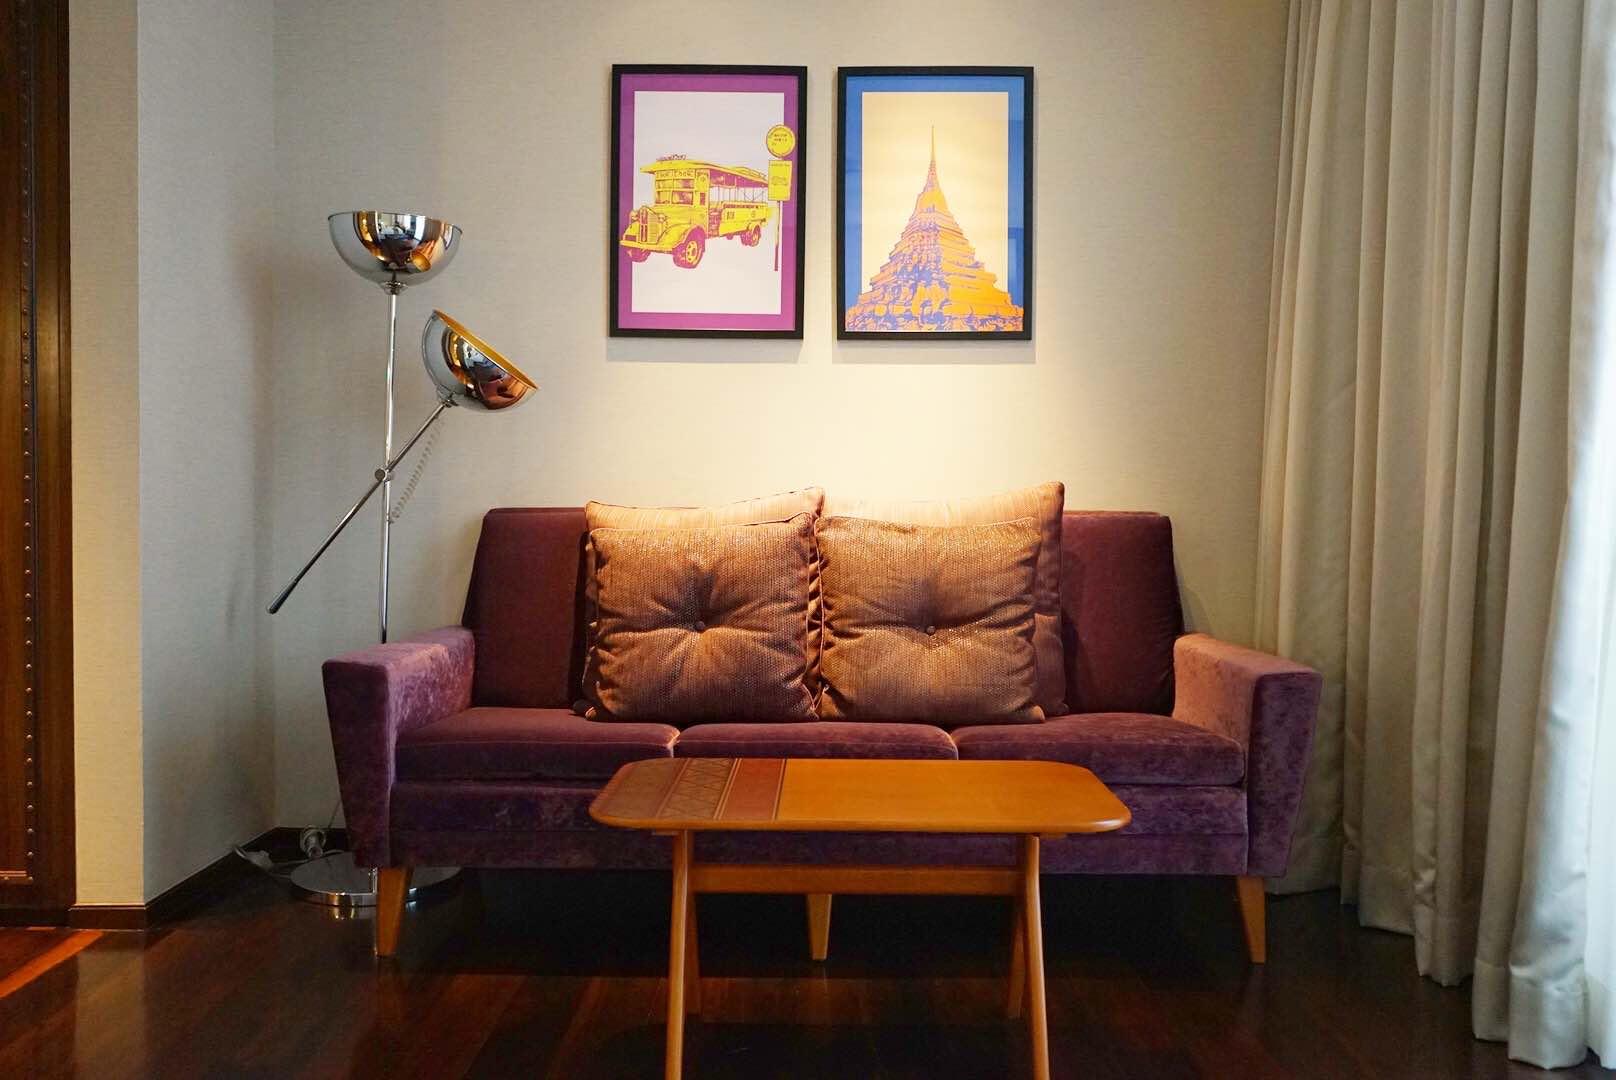 Hotel Indigo Bangkok Room Sofa - AspirantSG